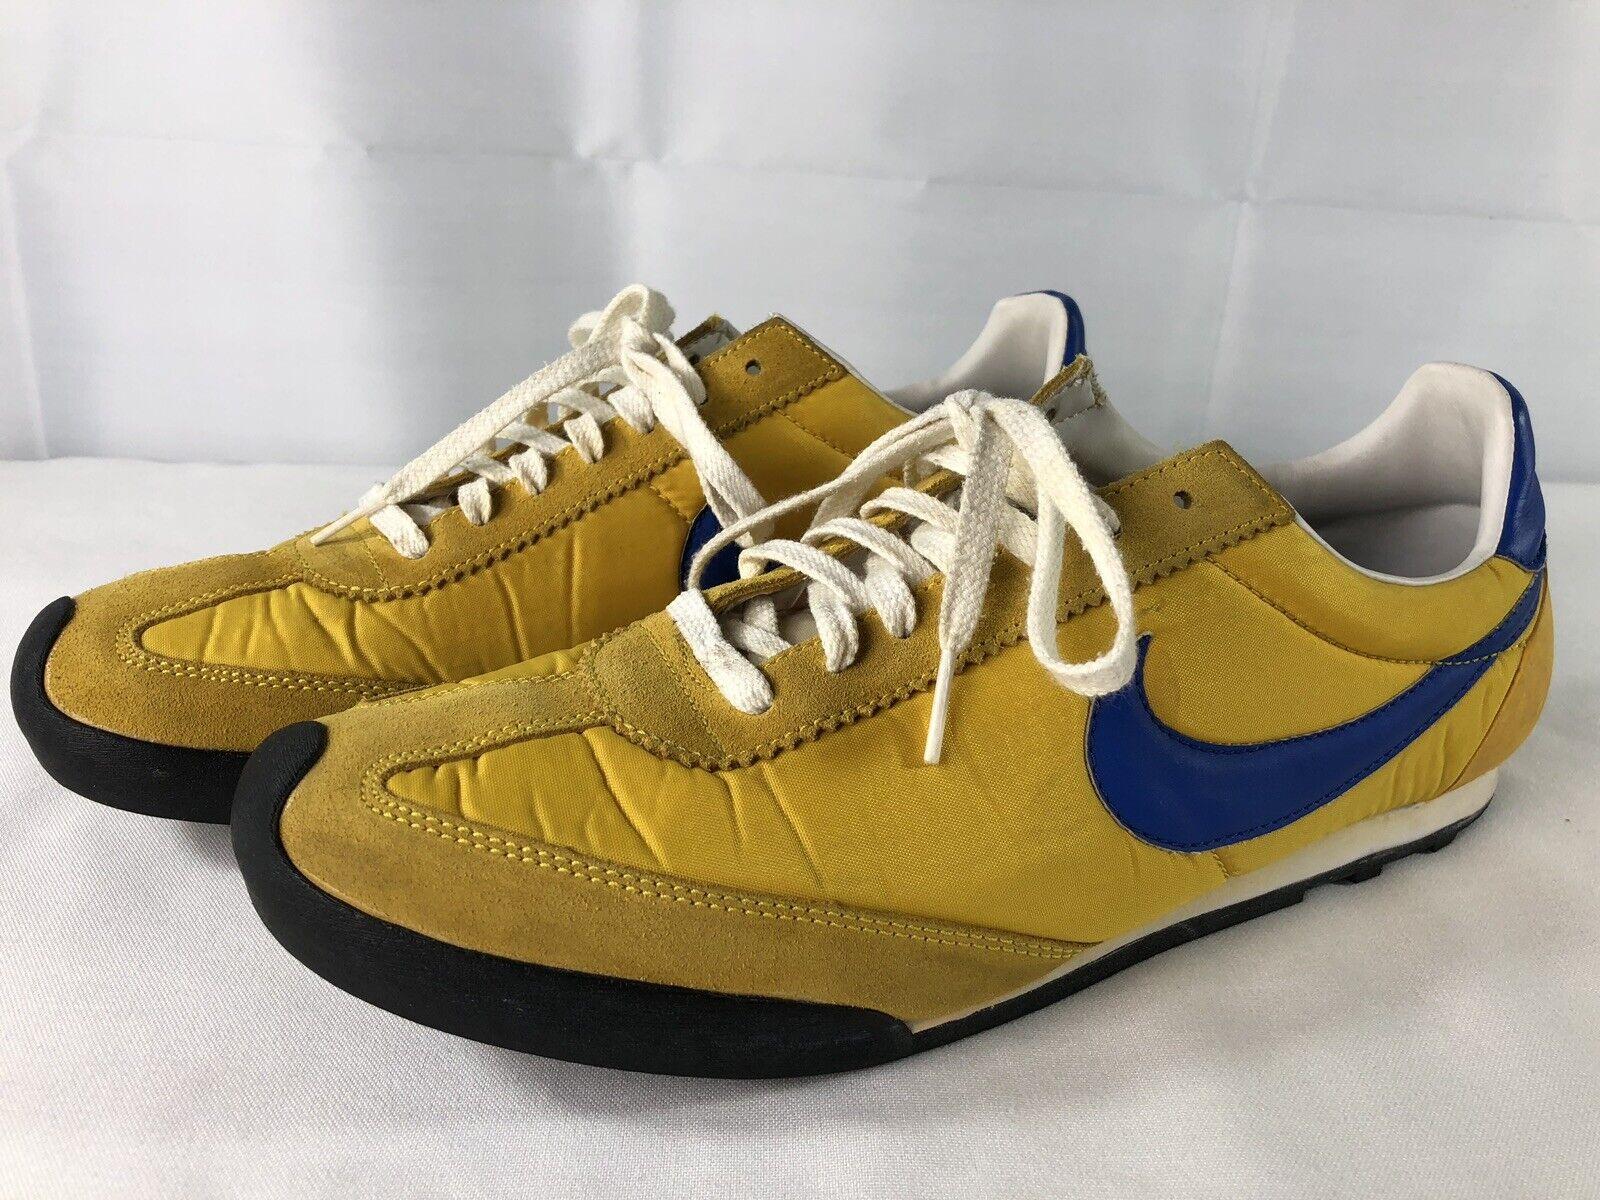 Nike Rockwaffle Size 11.5 Vintage Yellow bluee Rare 385452 741